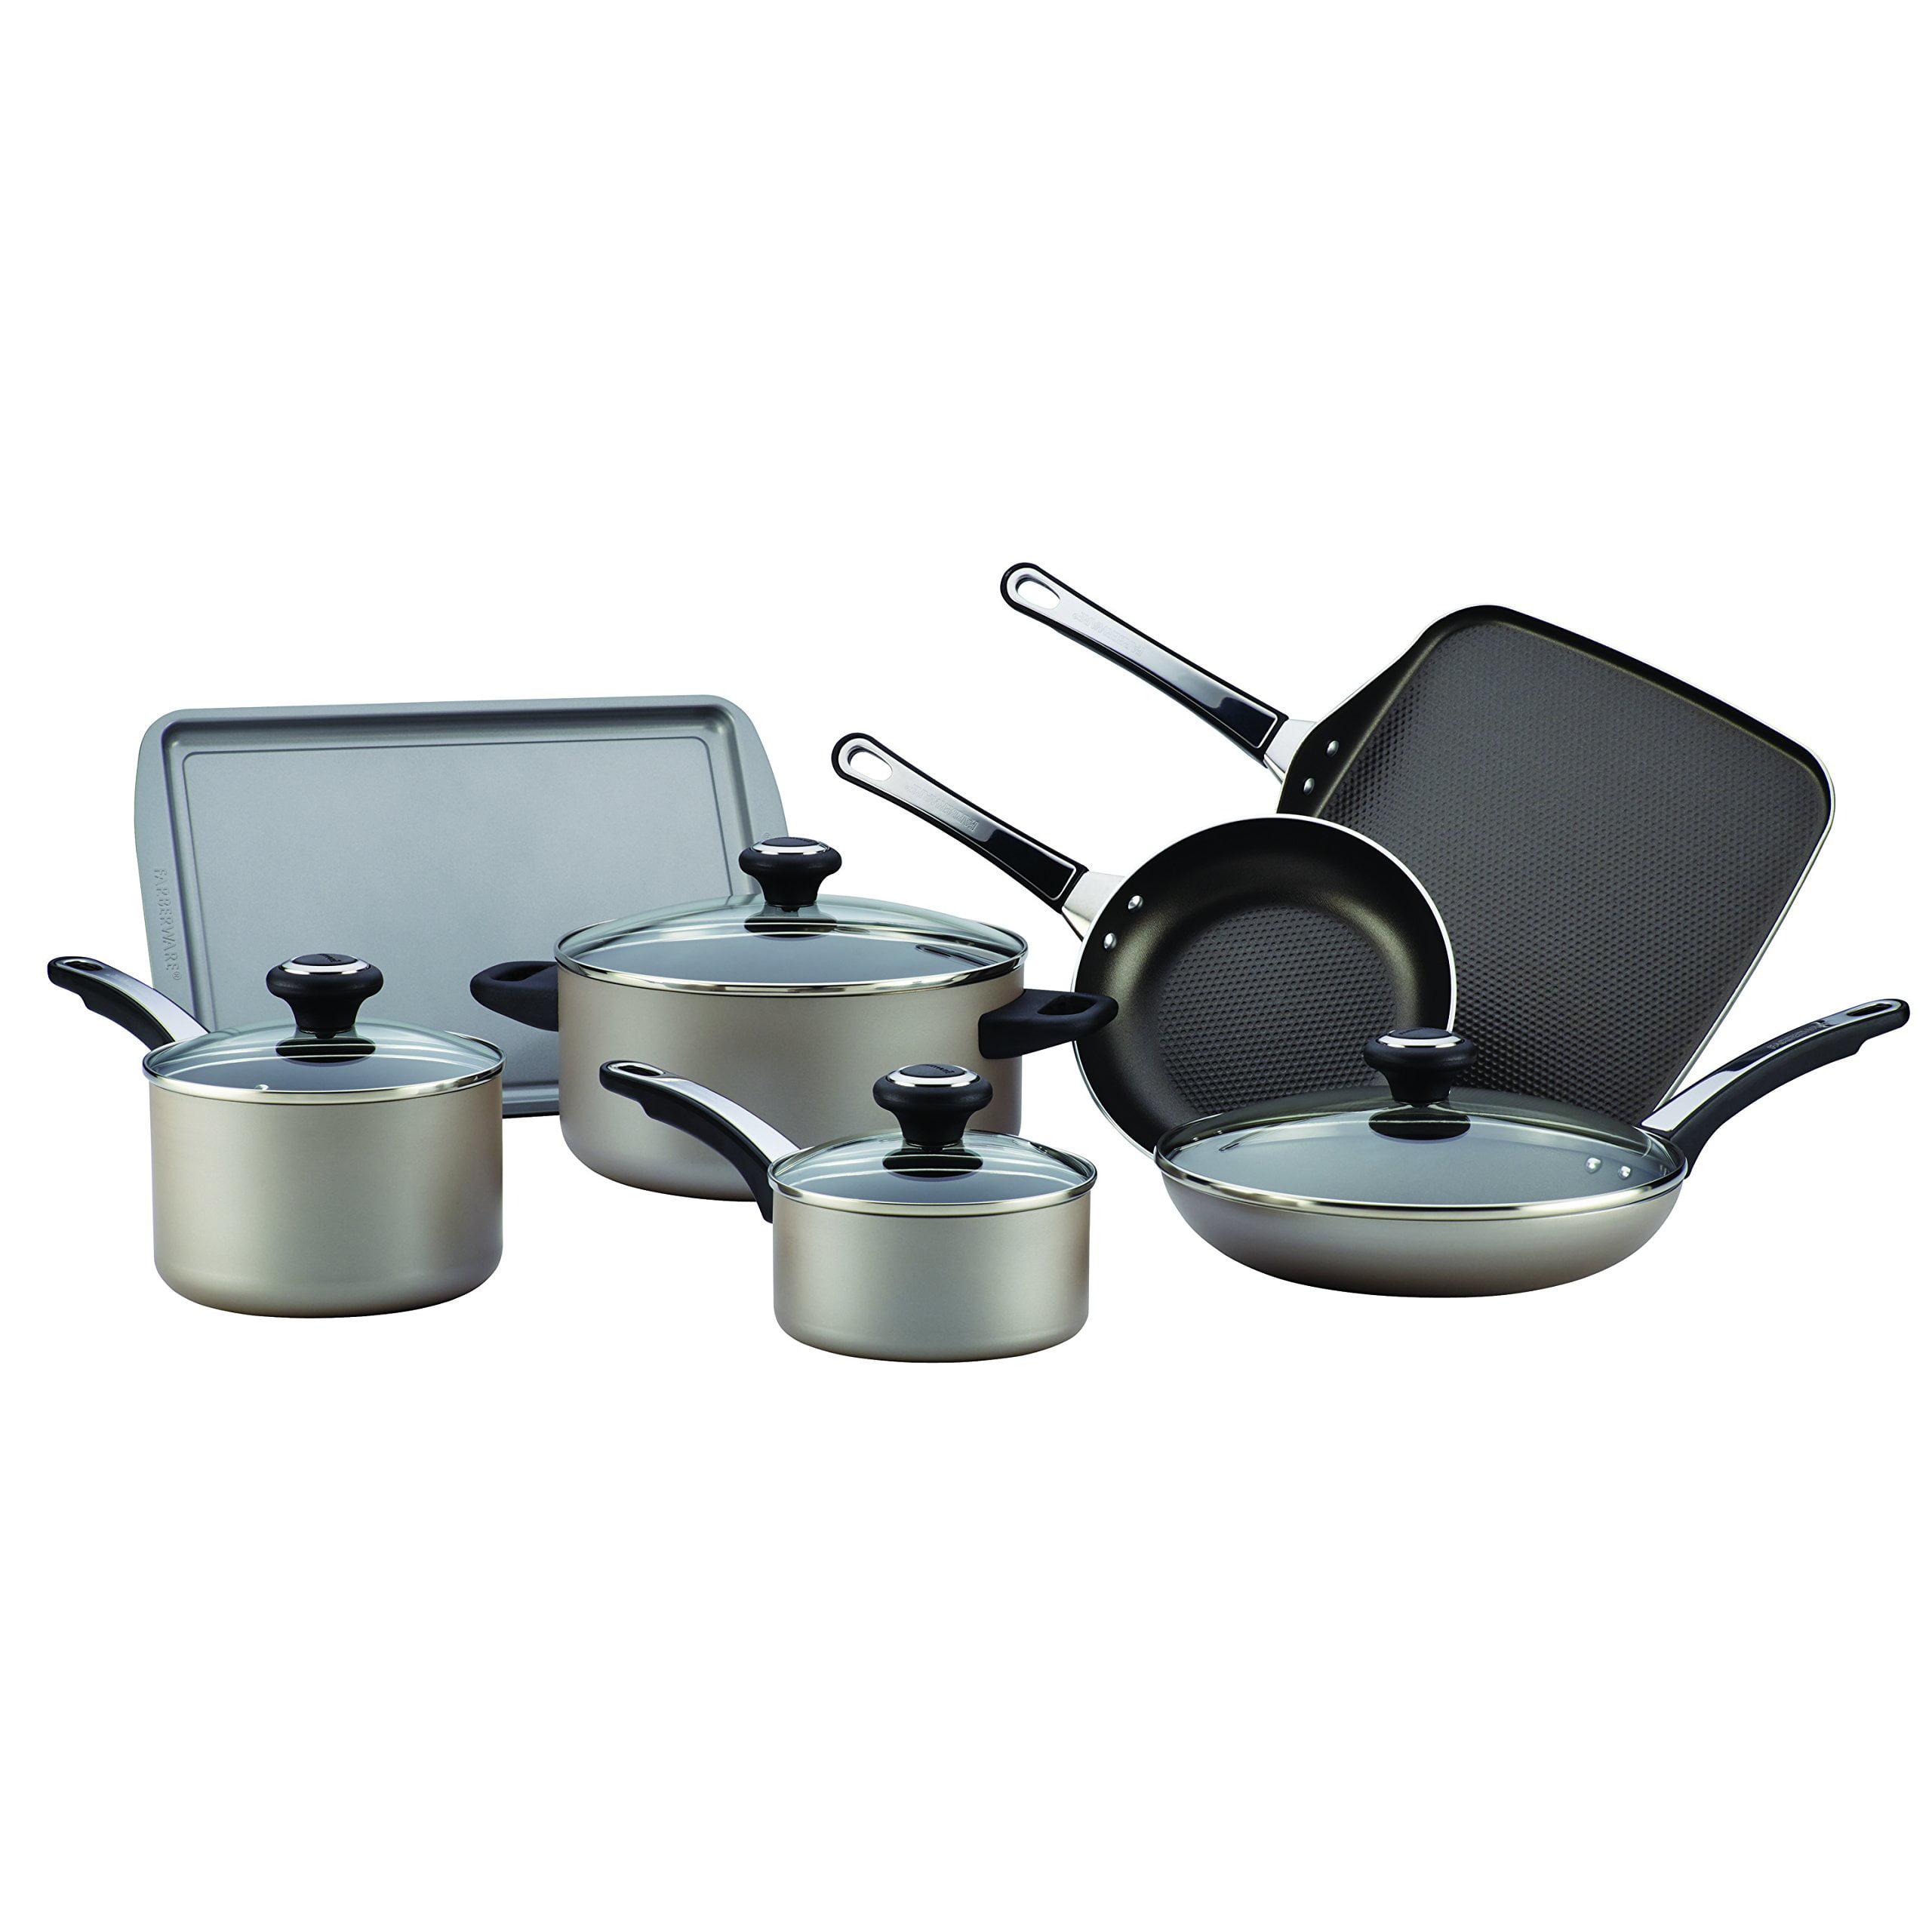 Farberware Faberware High Performance Nonstick 17-Piece Cookware Set